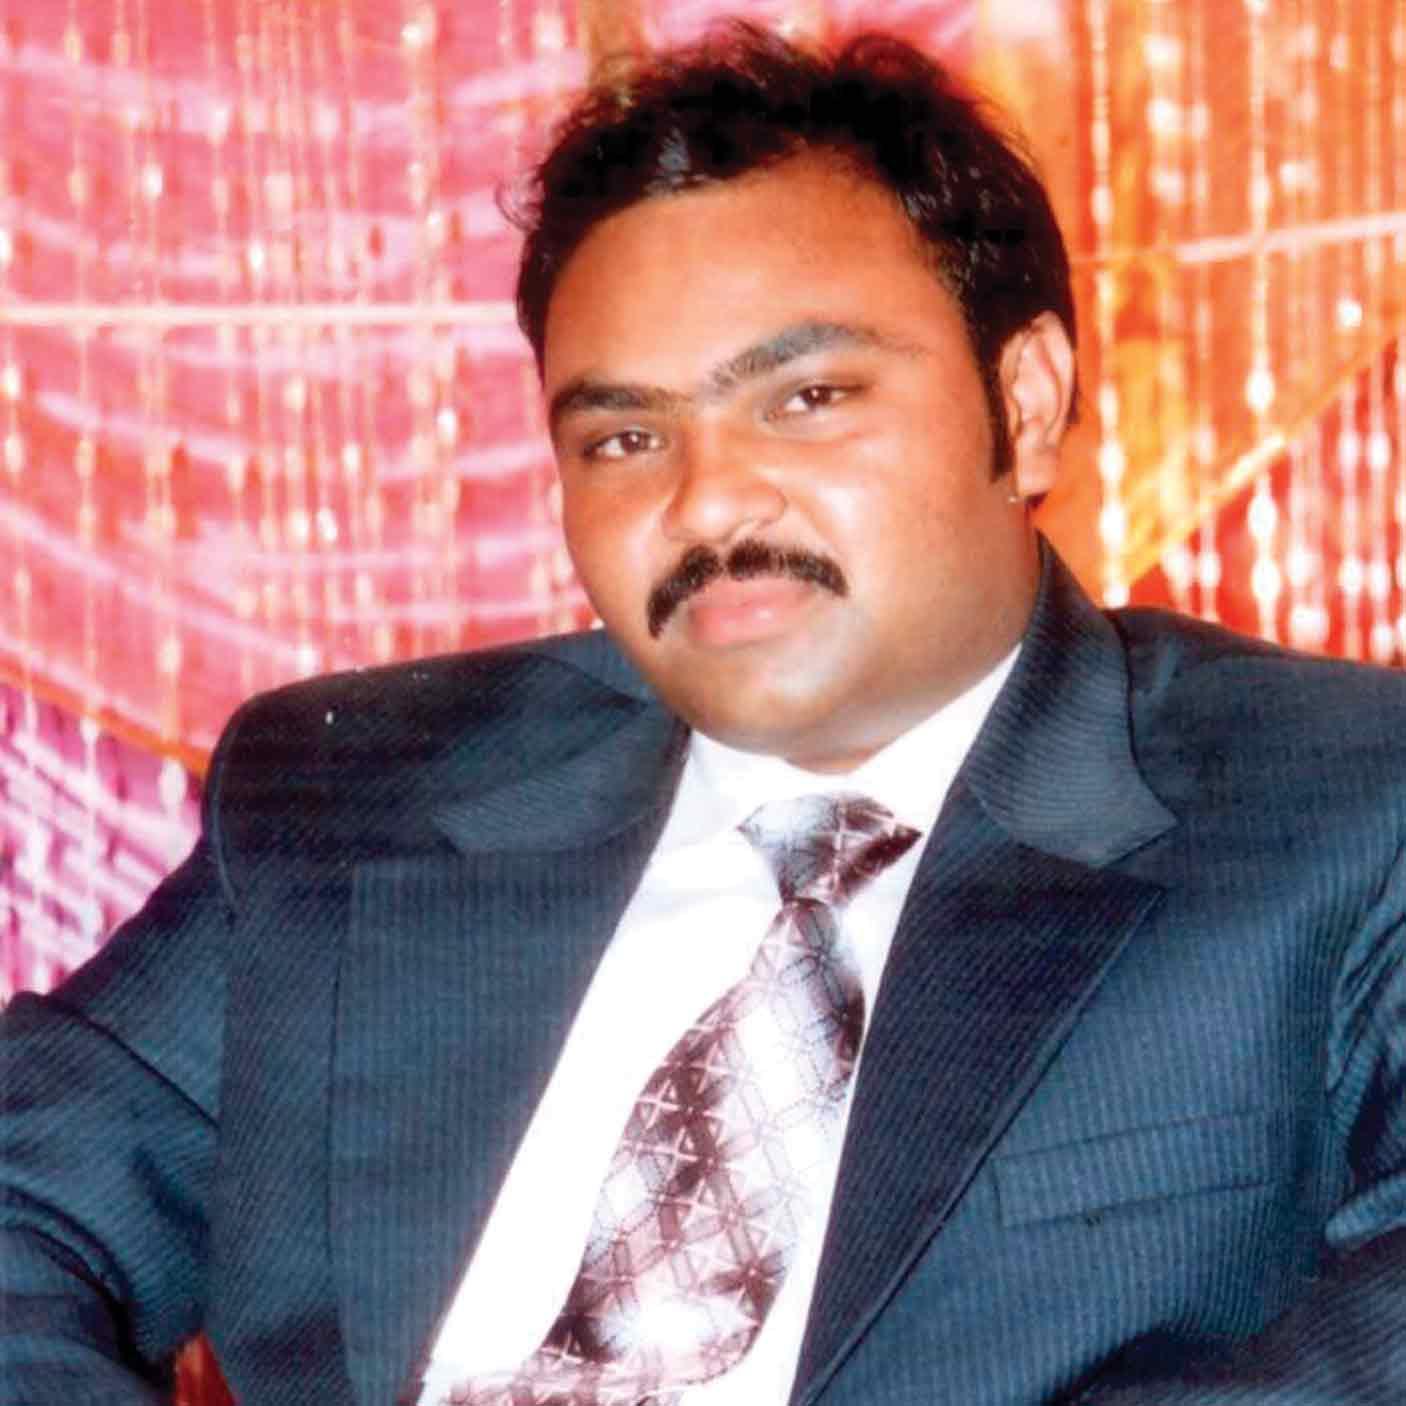 Imran Ghafur has been in prison since 2009.